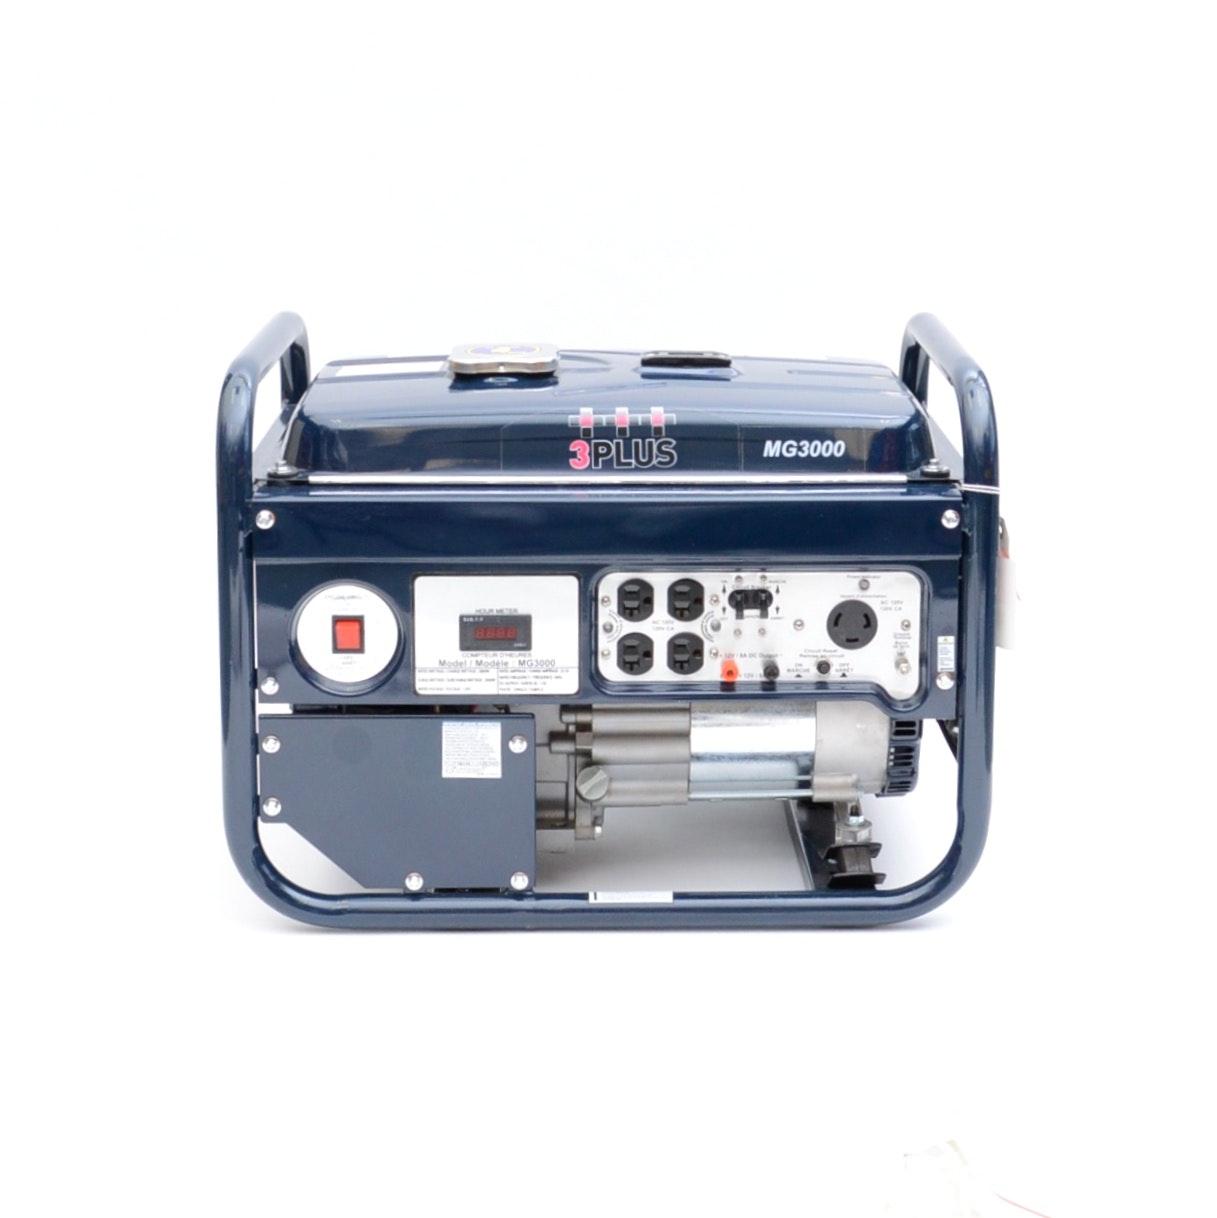 3 PLUS 3000 Watt Generator